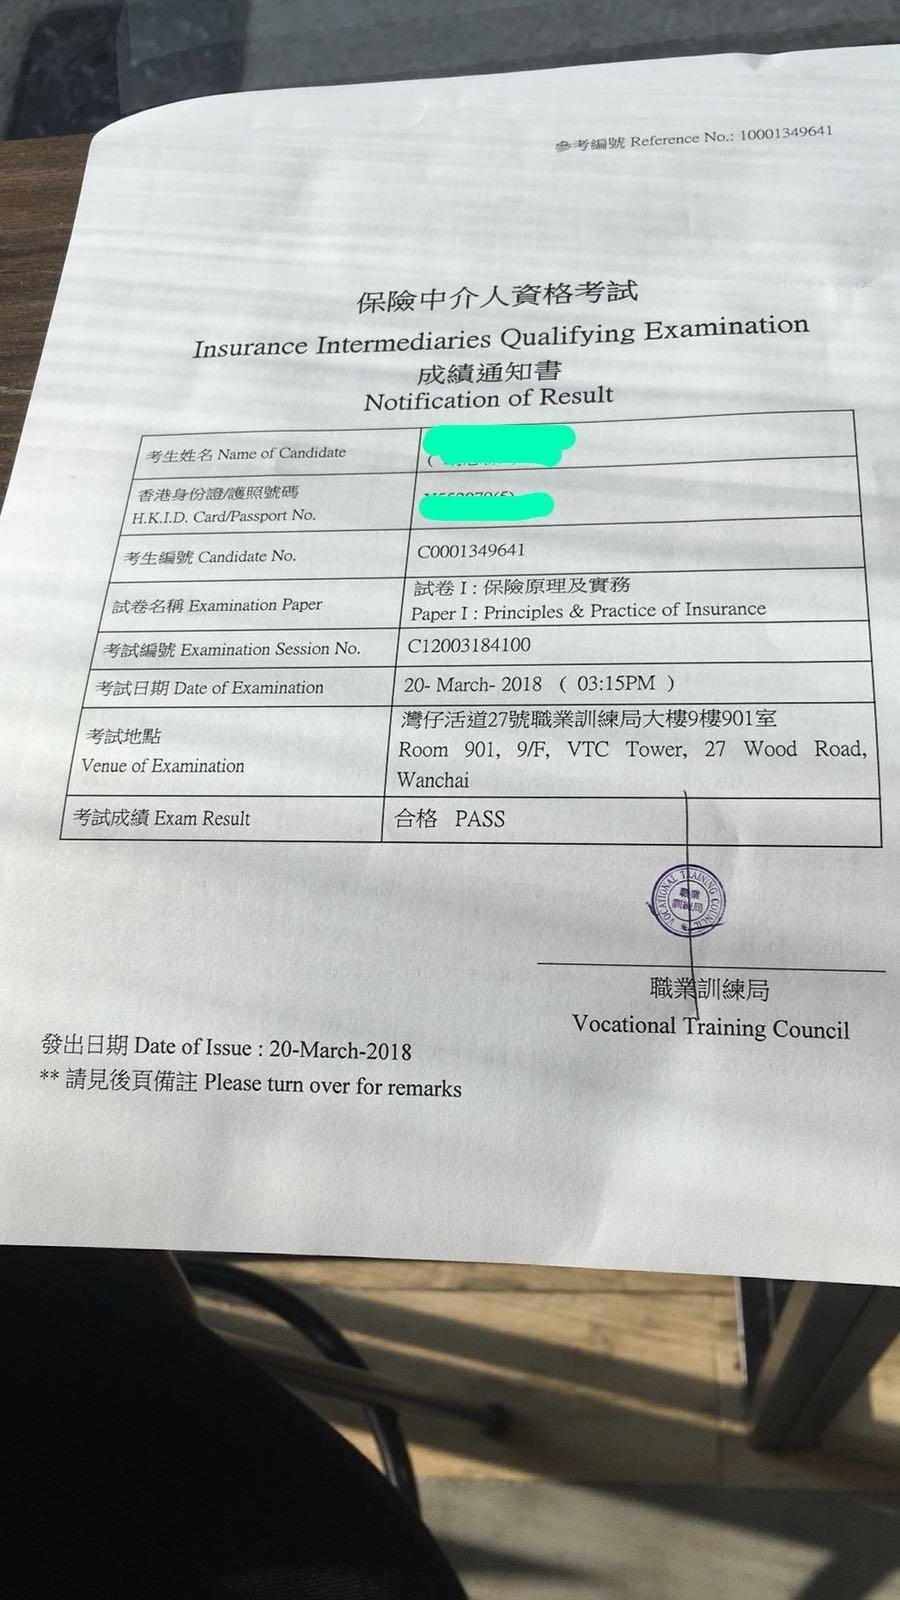 CKW 20/3/2018 IIQE Paper 1 保險中介人資格考試卷一 Pass